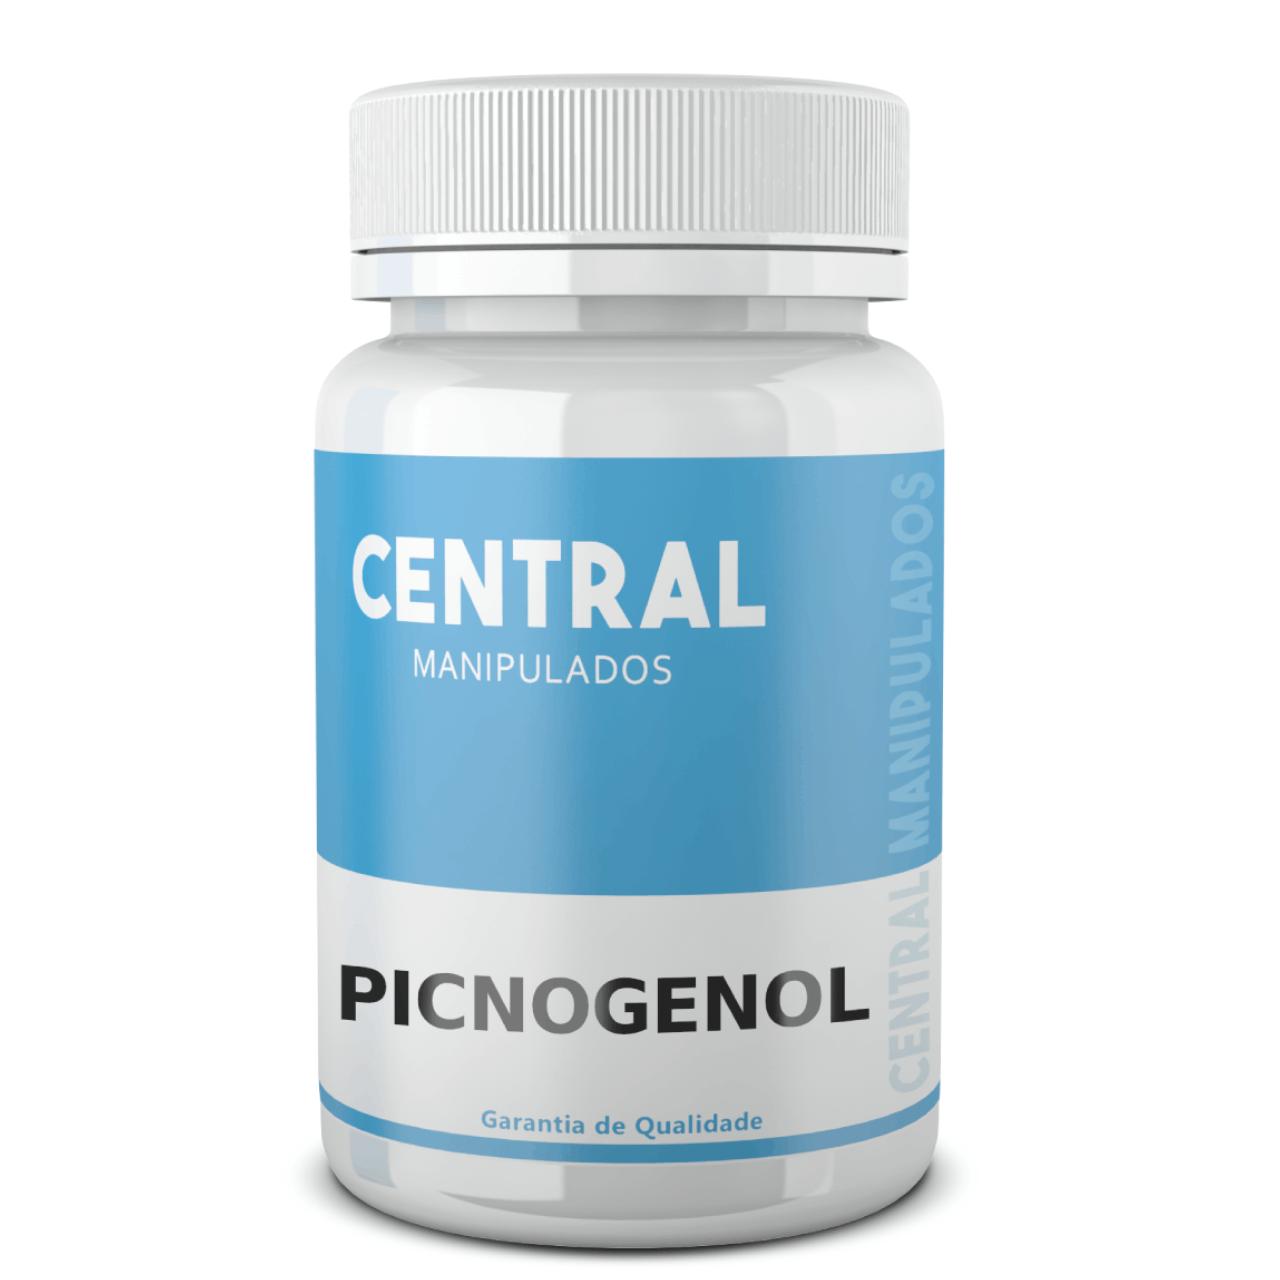 Picnogenol 300mg - 120 cápsulas - (pinus Pinaster) Pycnogenol - ANTIOXIDANTE